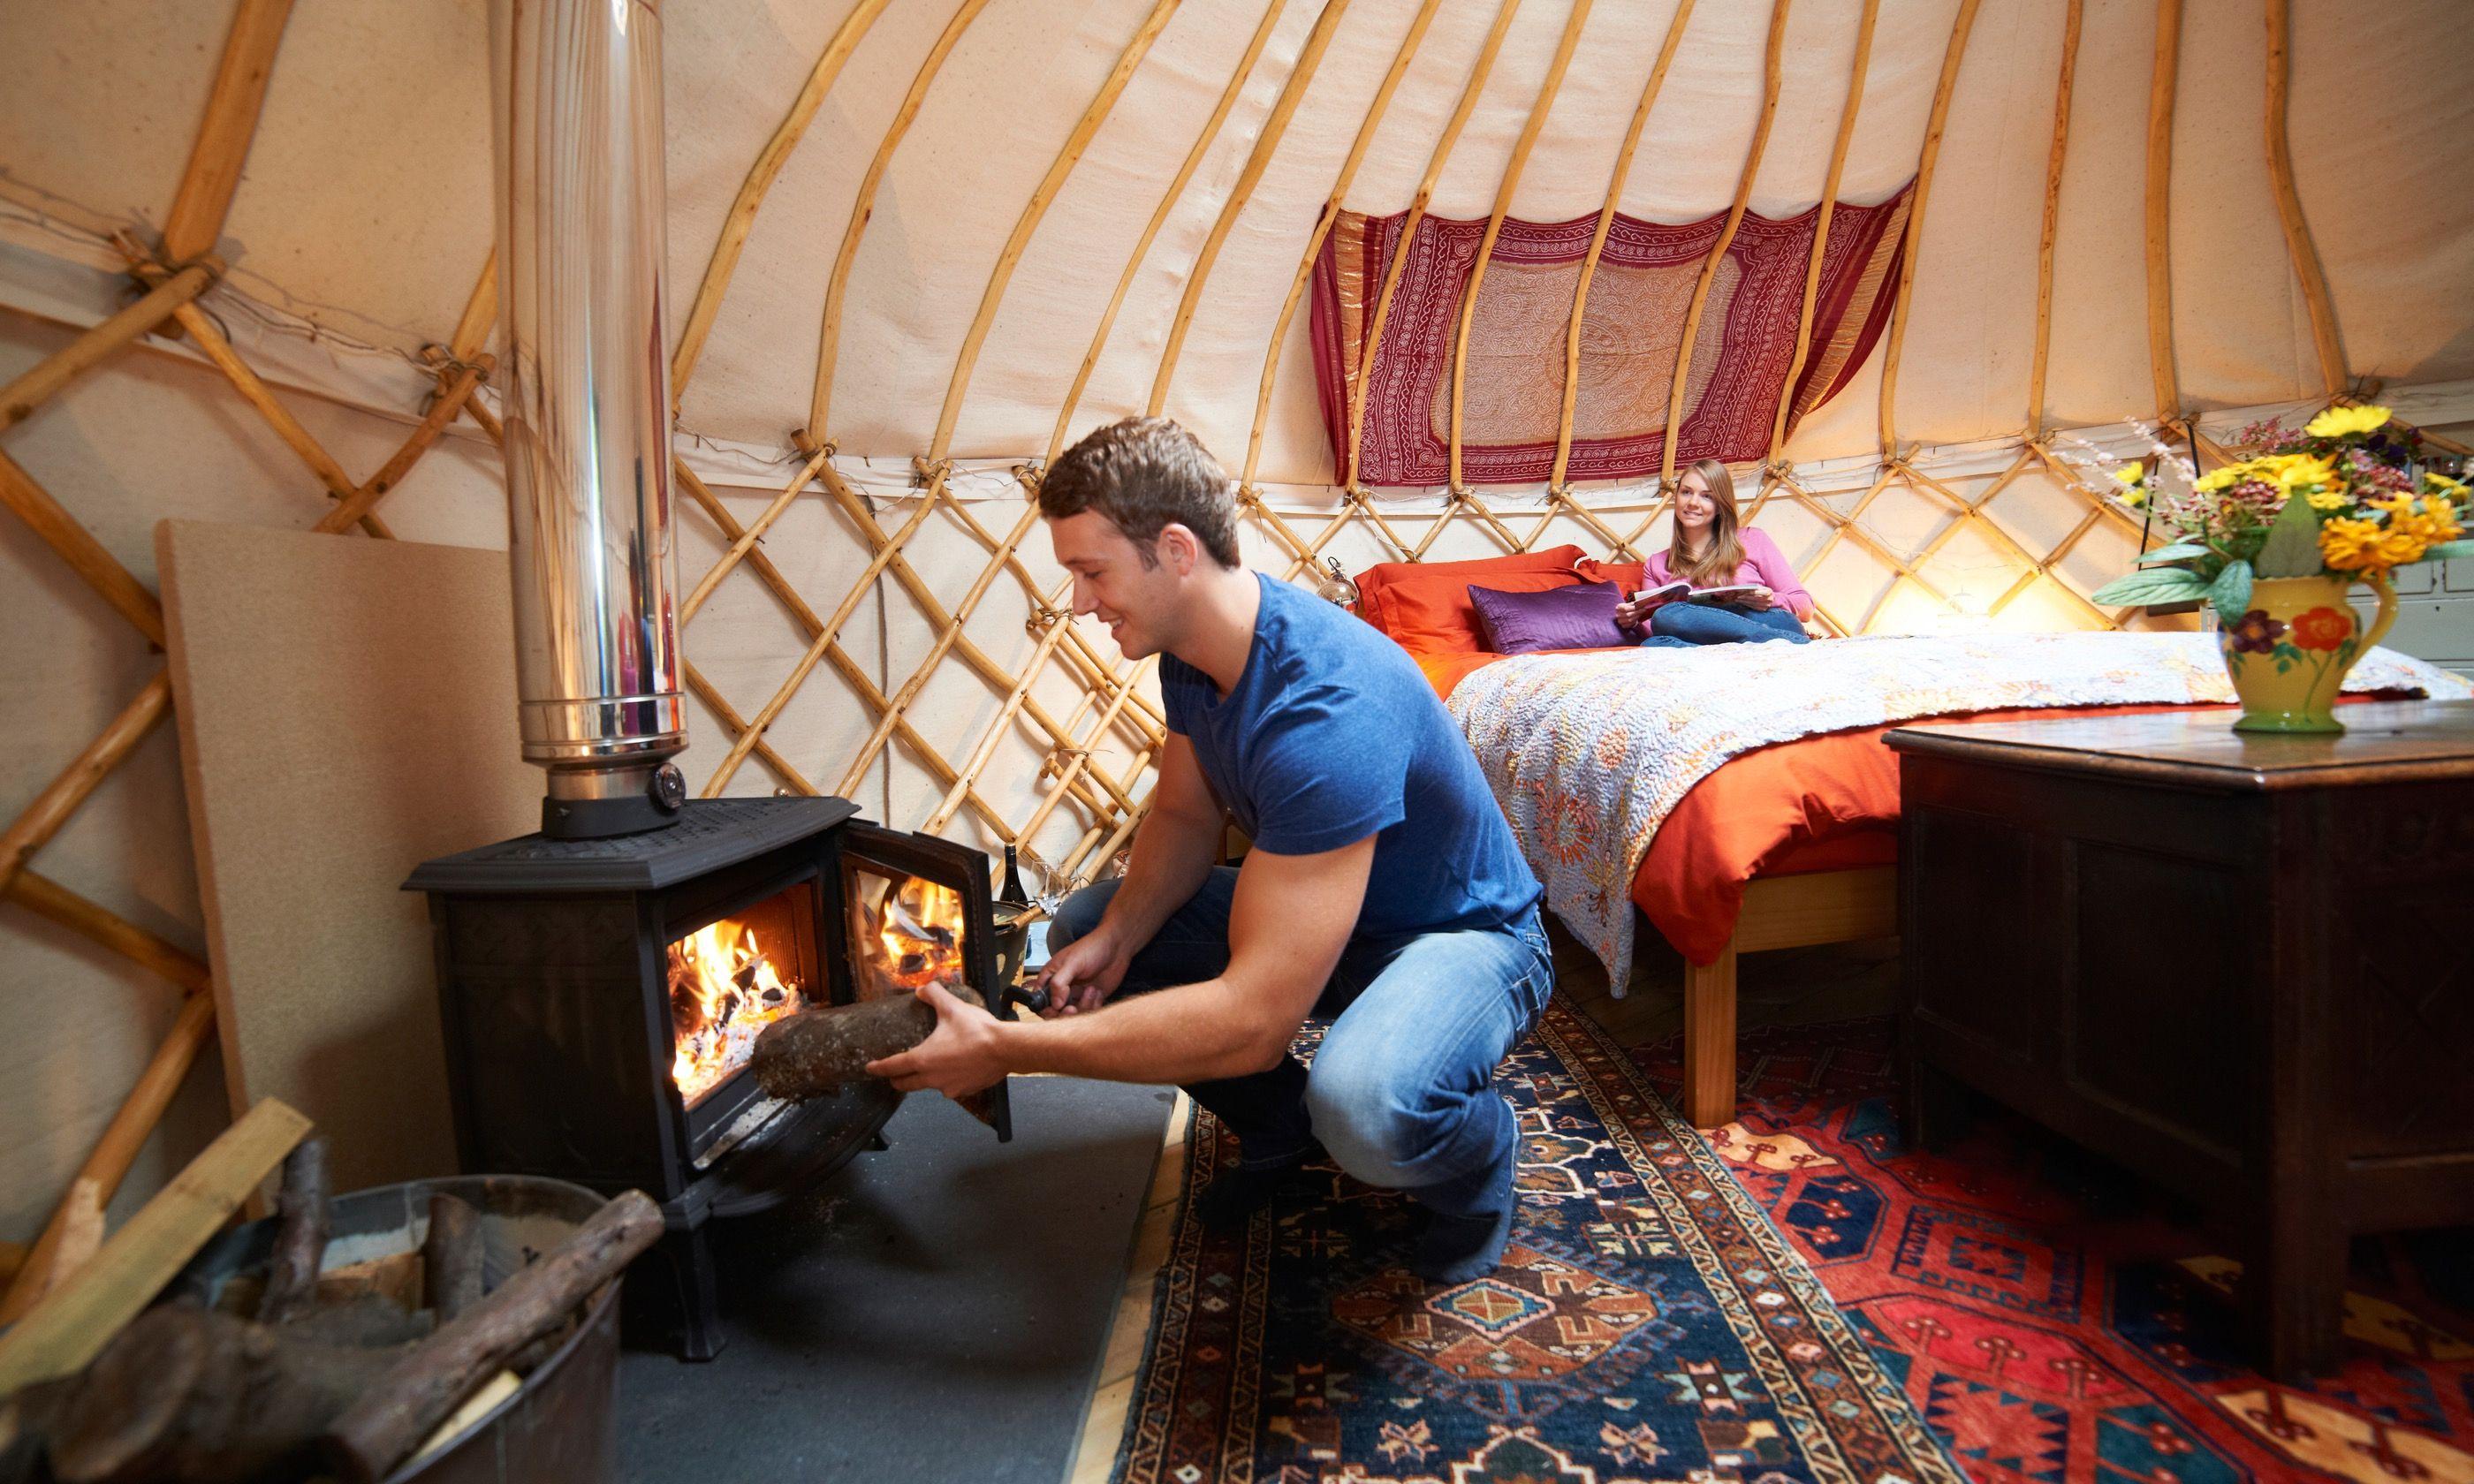 Firing up the log burner in a yurt (Dreamstime)